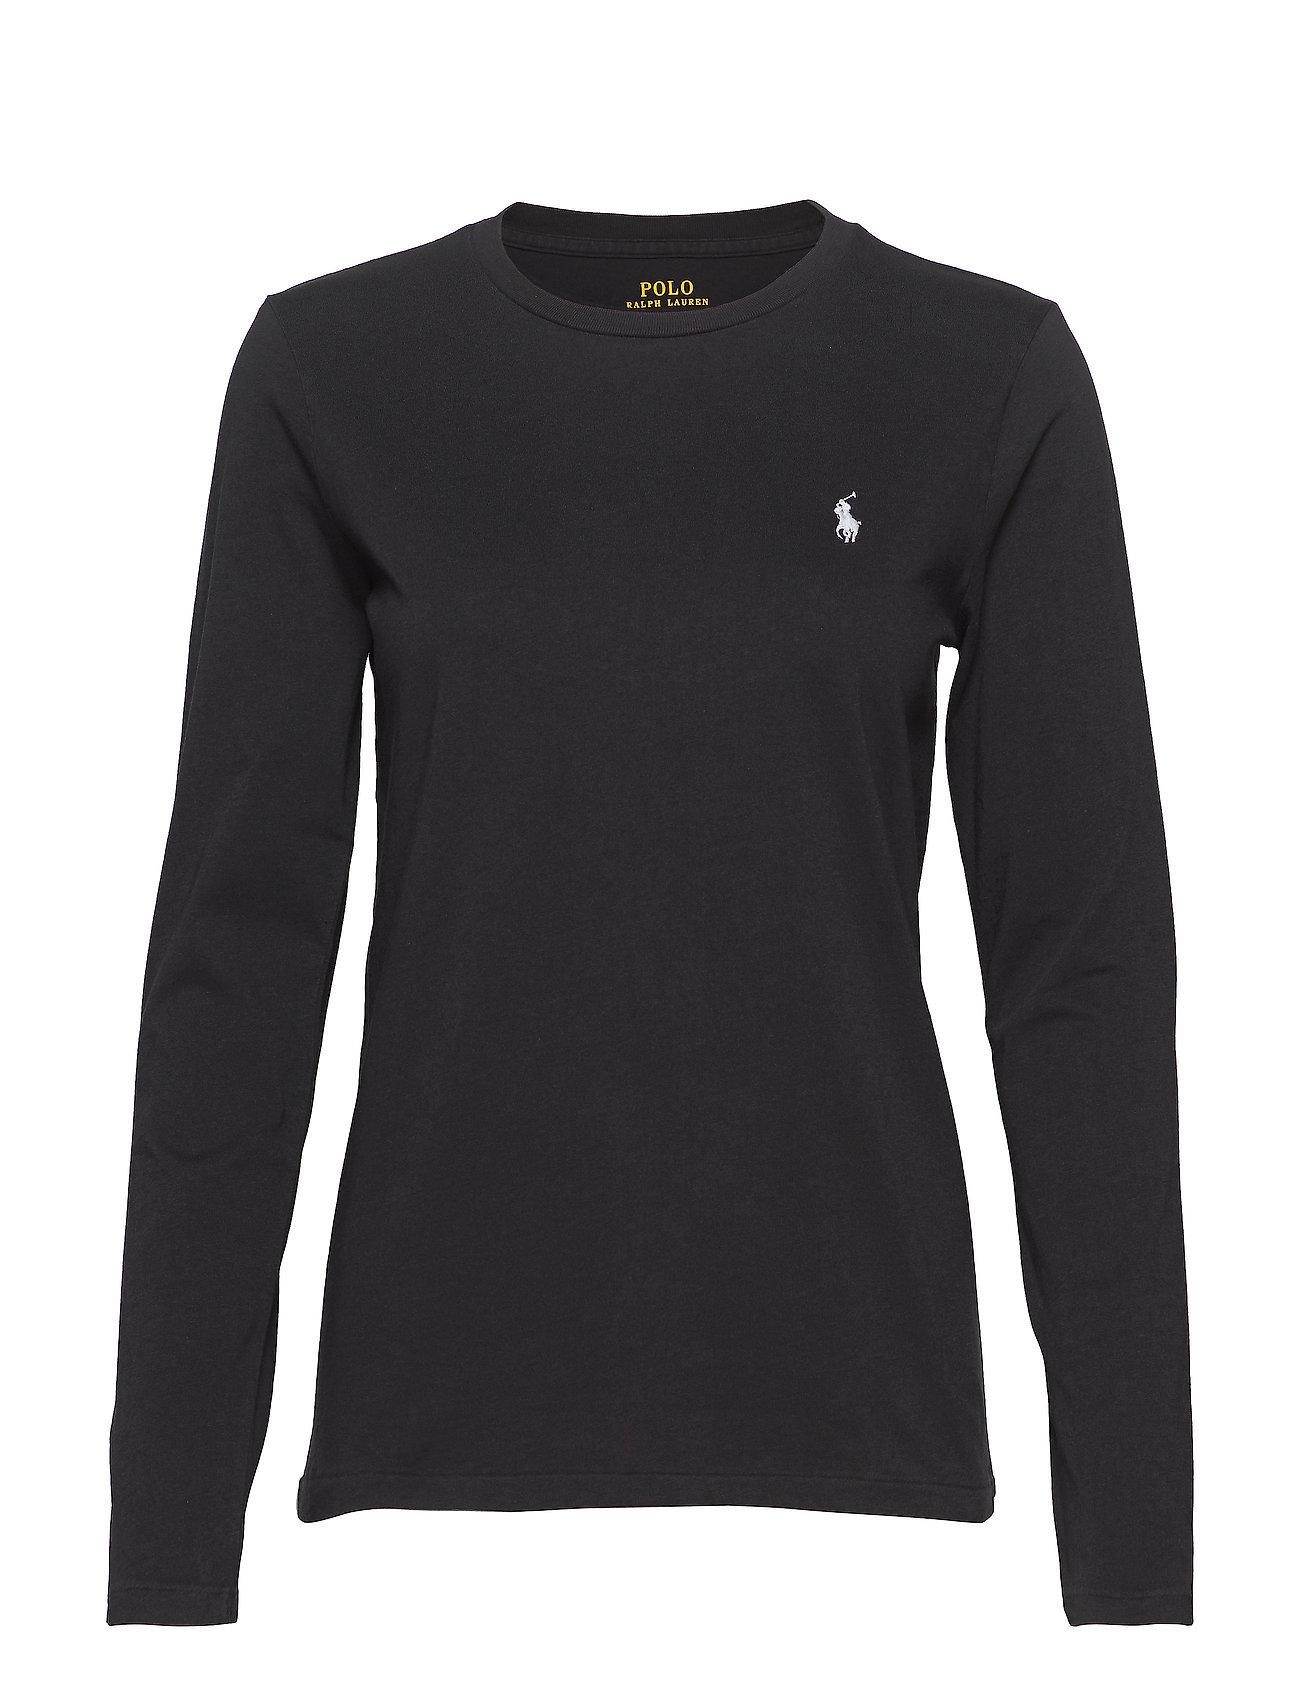 Polo Ralph Lauren Jersey Long-Sleeve Shirt - POLO BLACK